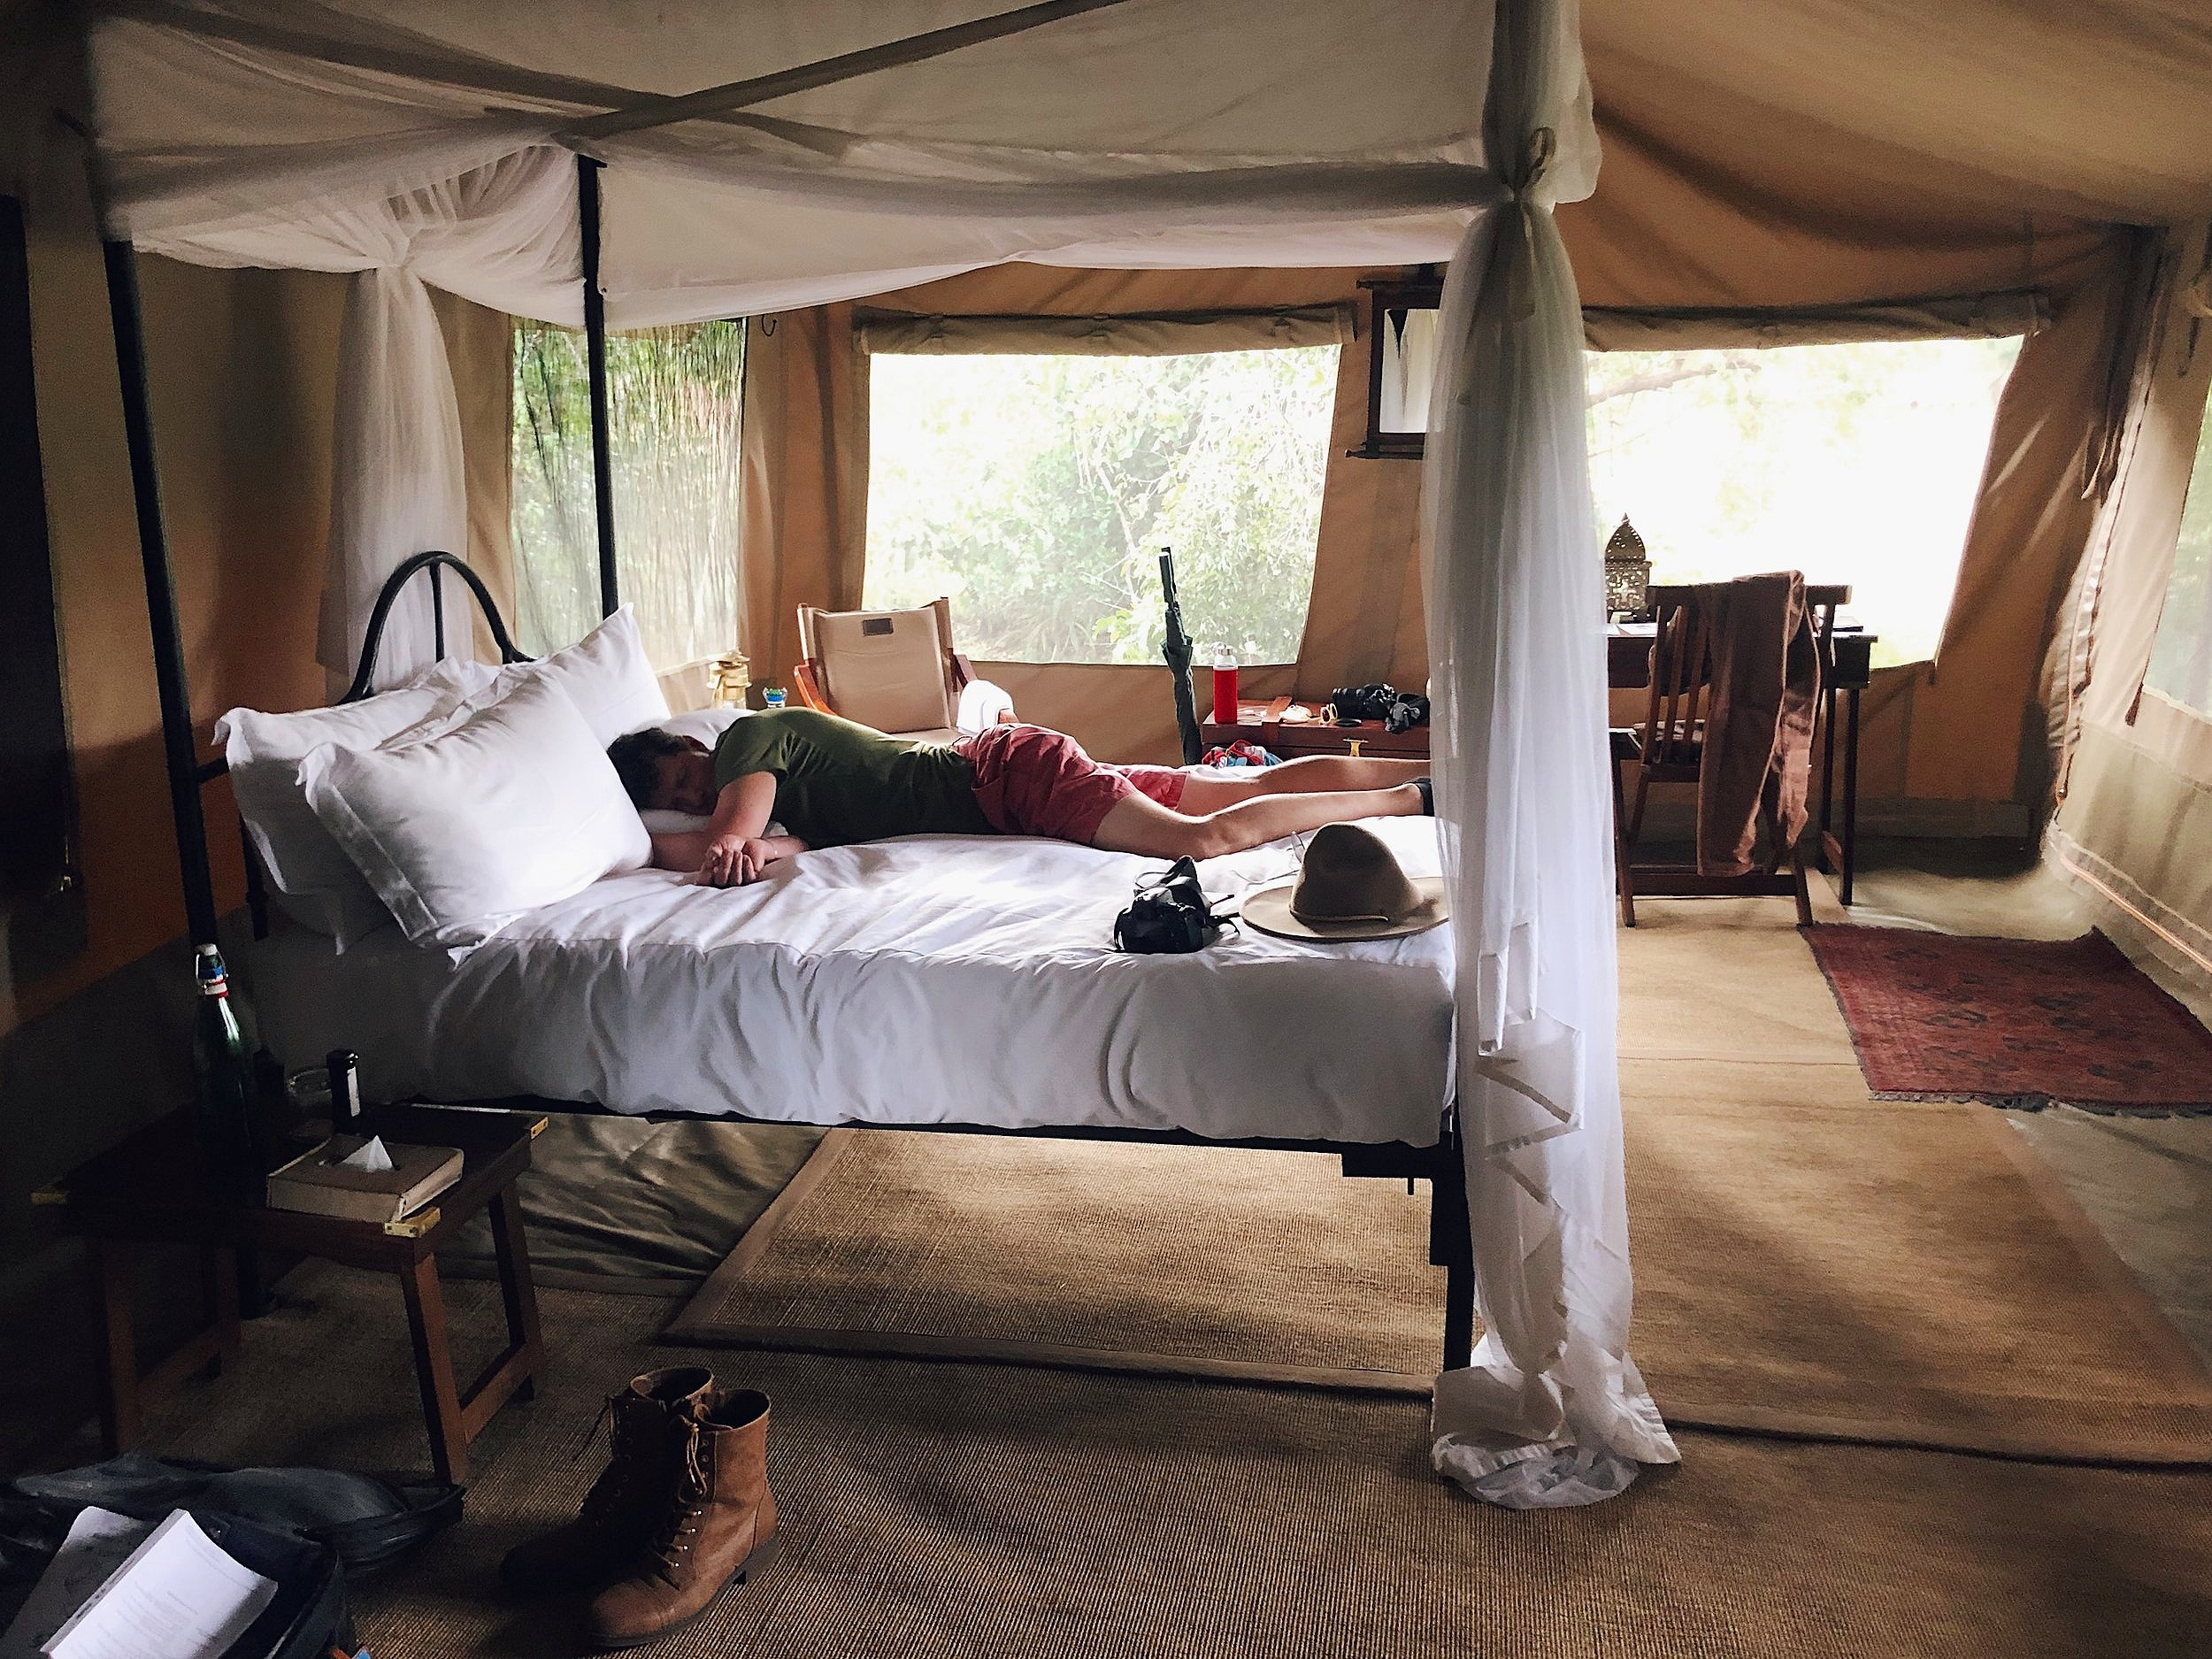 sentinel+mara+camp+masai+mara